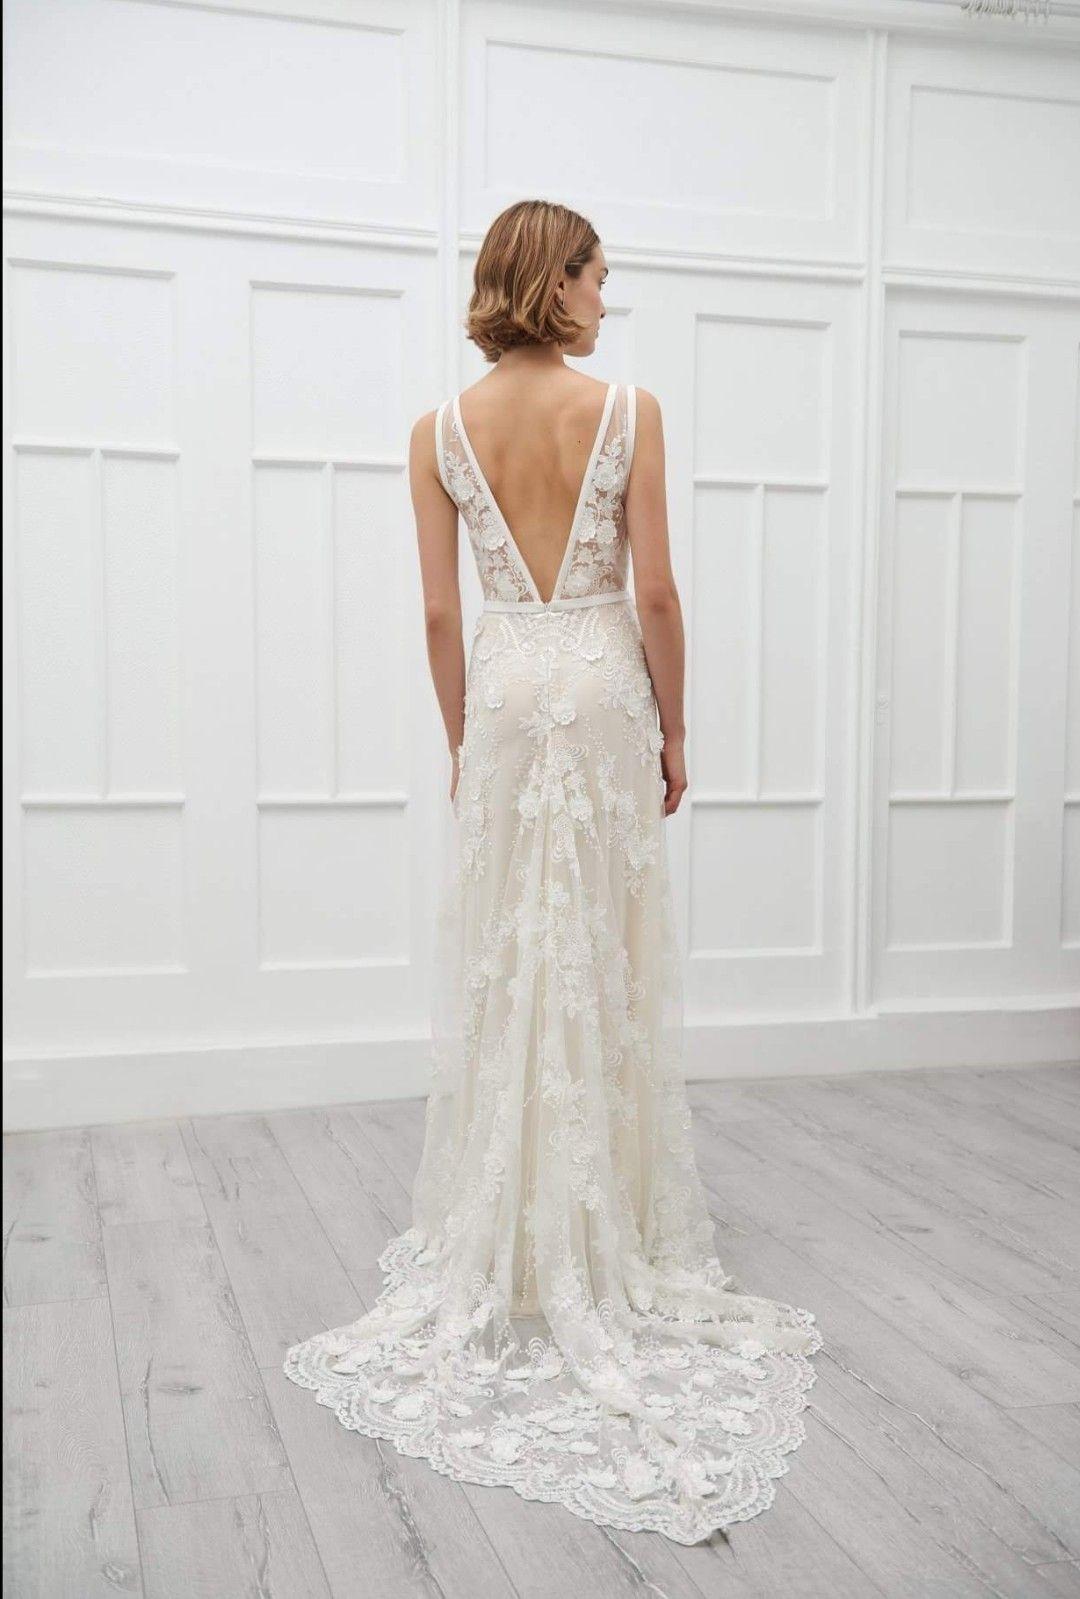 Lace wedding dress low back  Savannah D Wedding gown  VIKTORIACHAN BRIDAL Modern bride Bridal